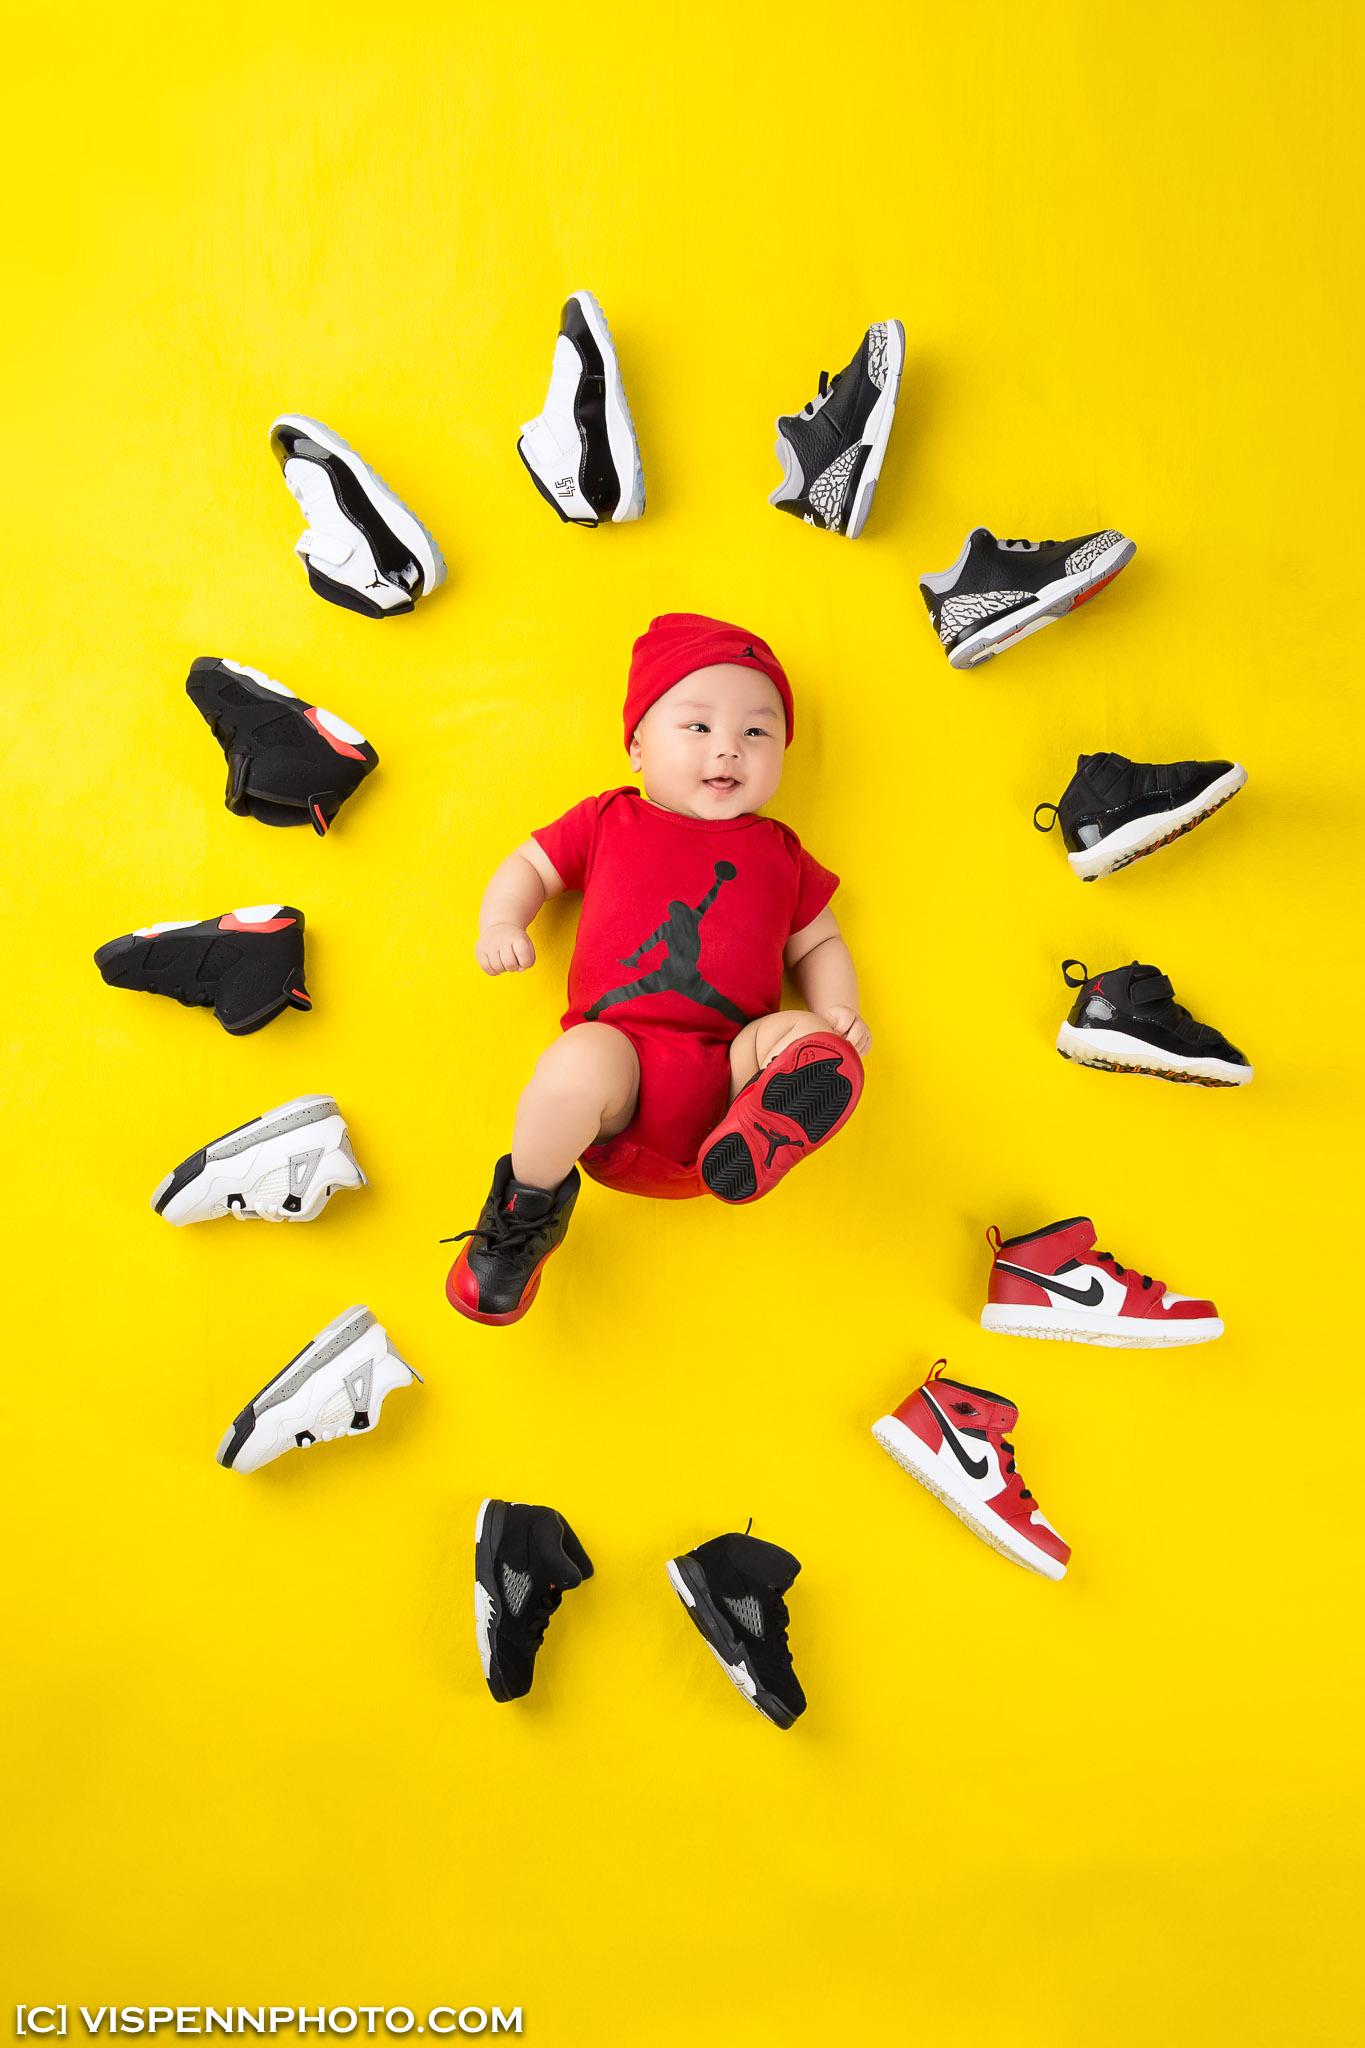 Melbourne Newborn Baby Family Photo BaoBao VISPENN 墨尔本 儿童 宝宝 百天照 满月照 孕妇照 全家福 100DAYS JessicaLIANG 1604 VISPENN